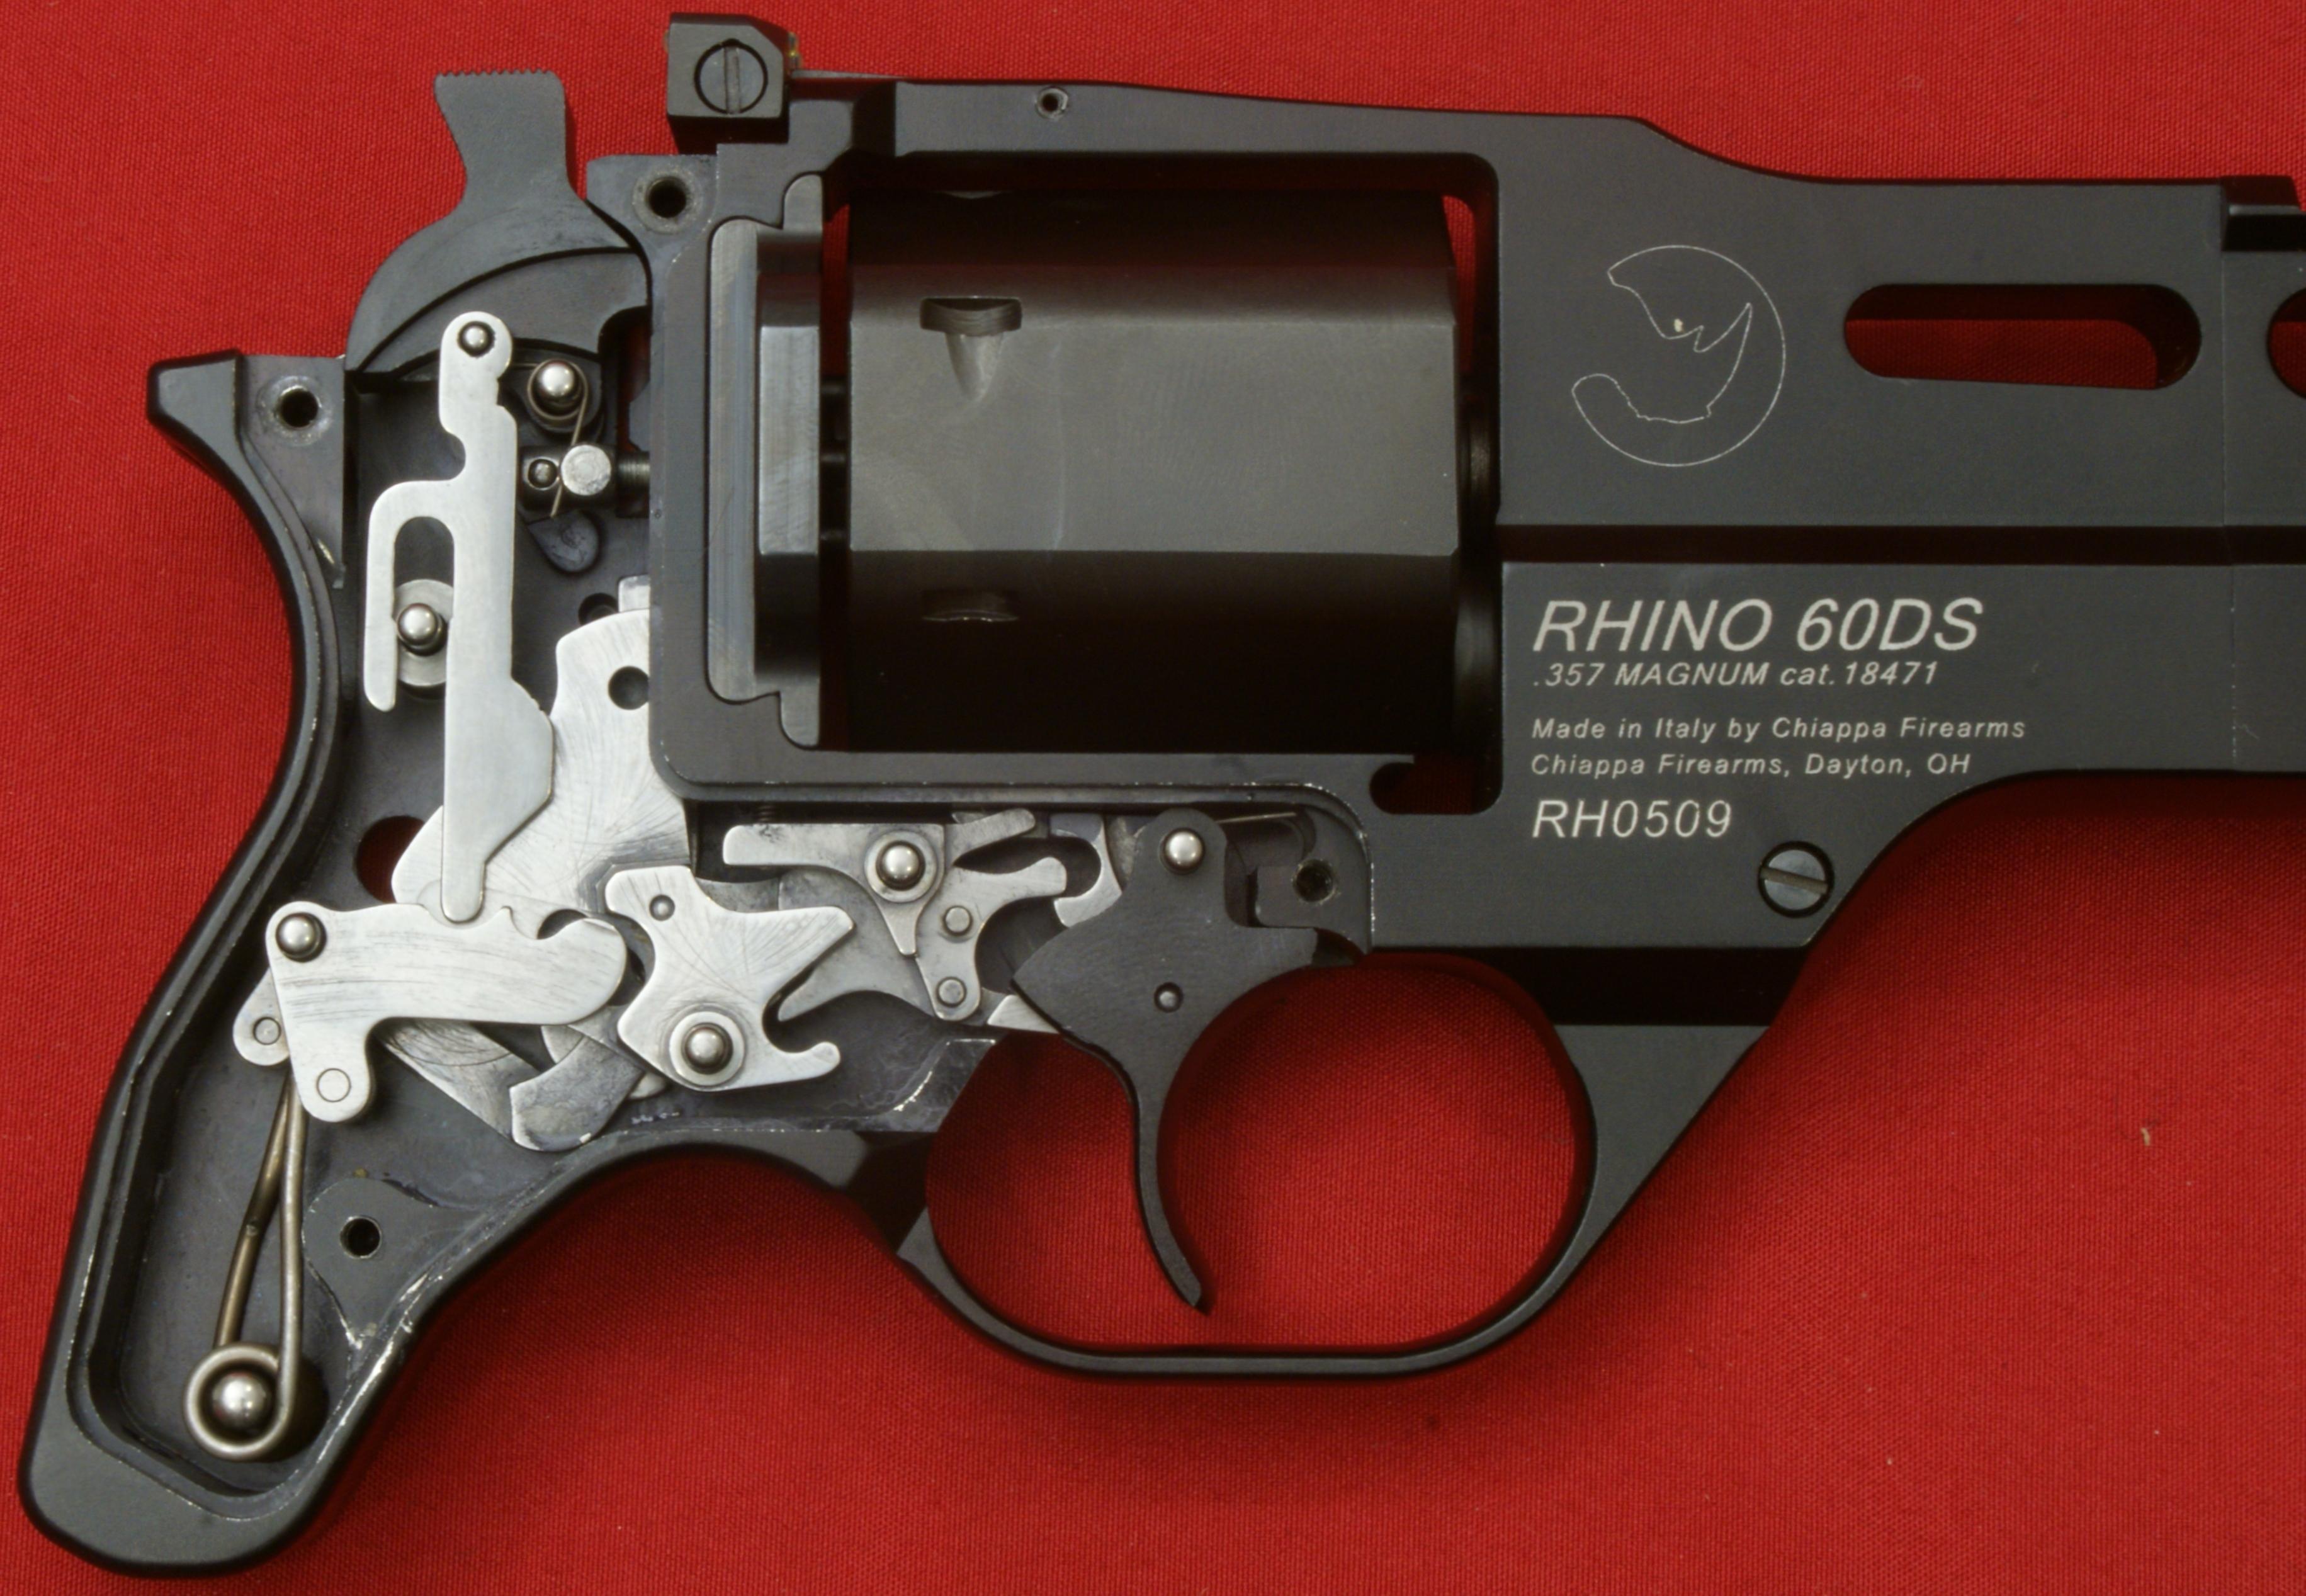 Chiappa Rhino Revolver High Quality Background on Wallpapers Vista